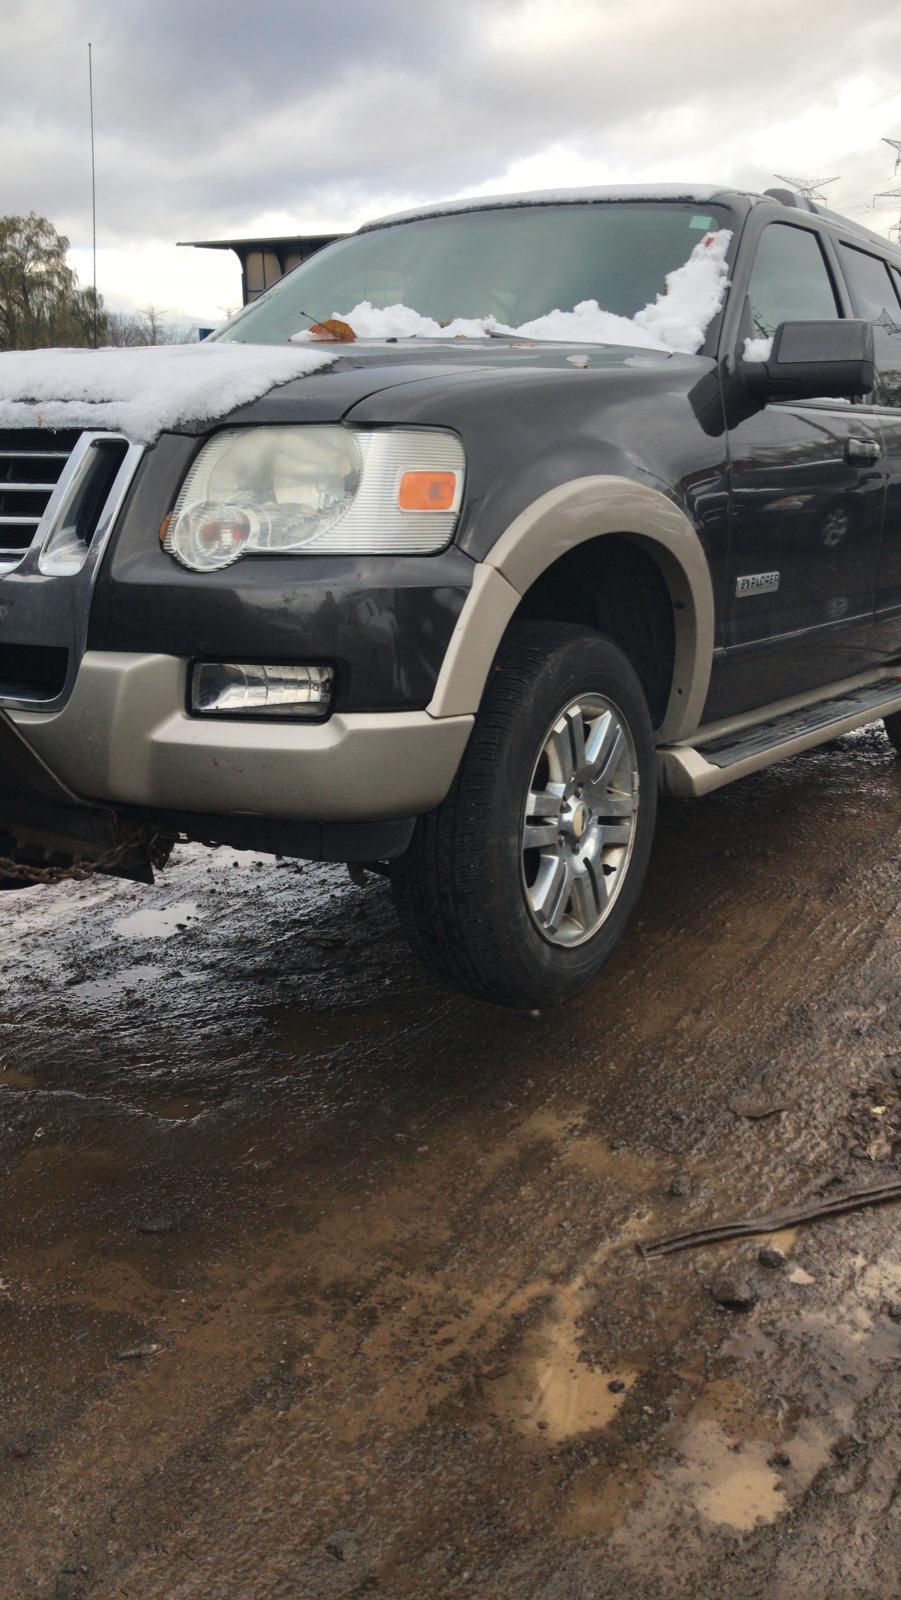 Scrap My Junk Cars - Auto Wrecking in Toronto